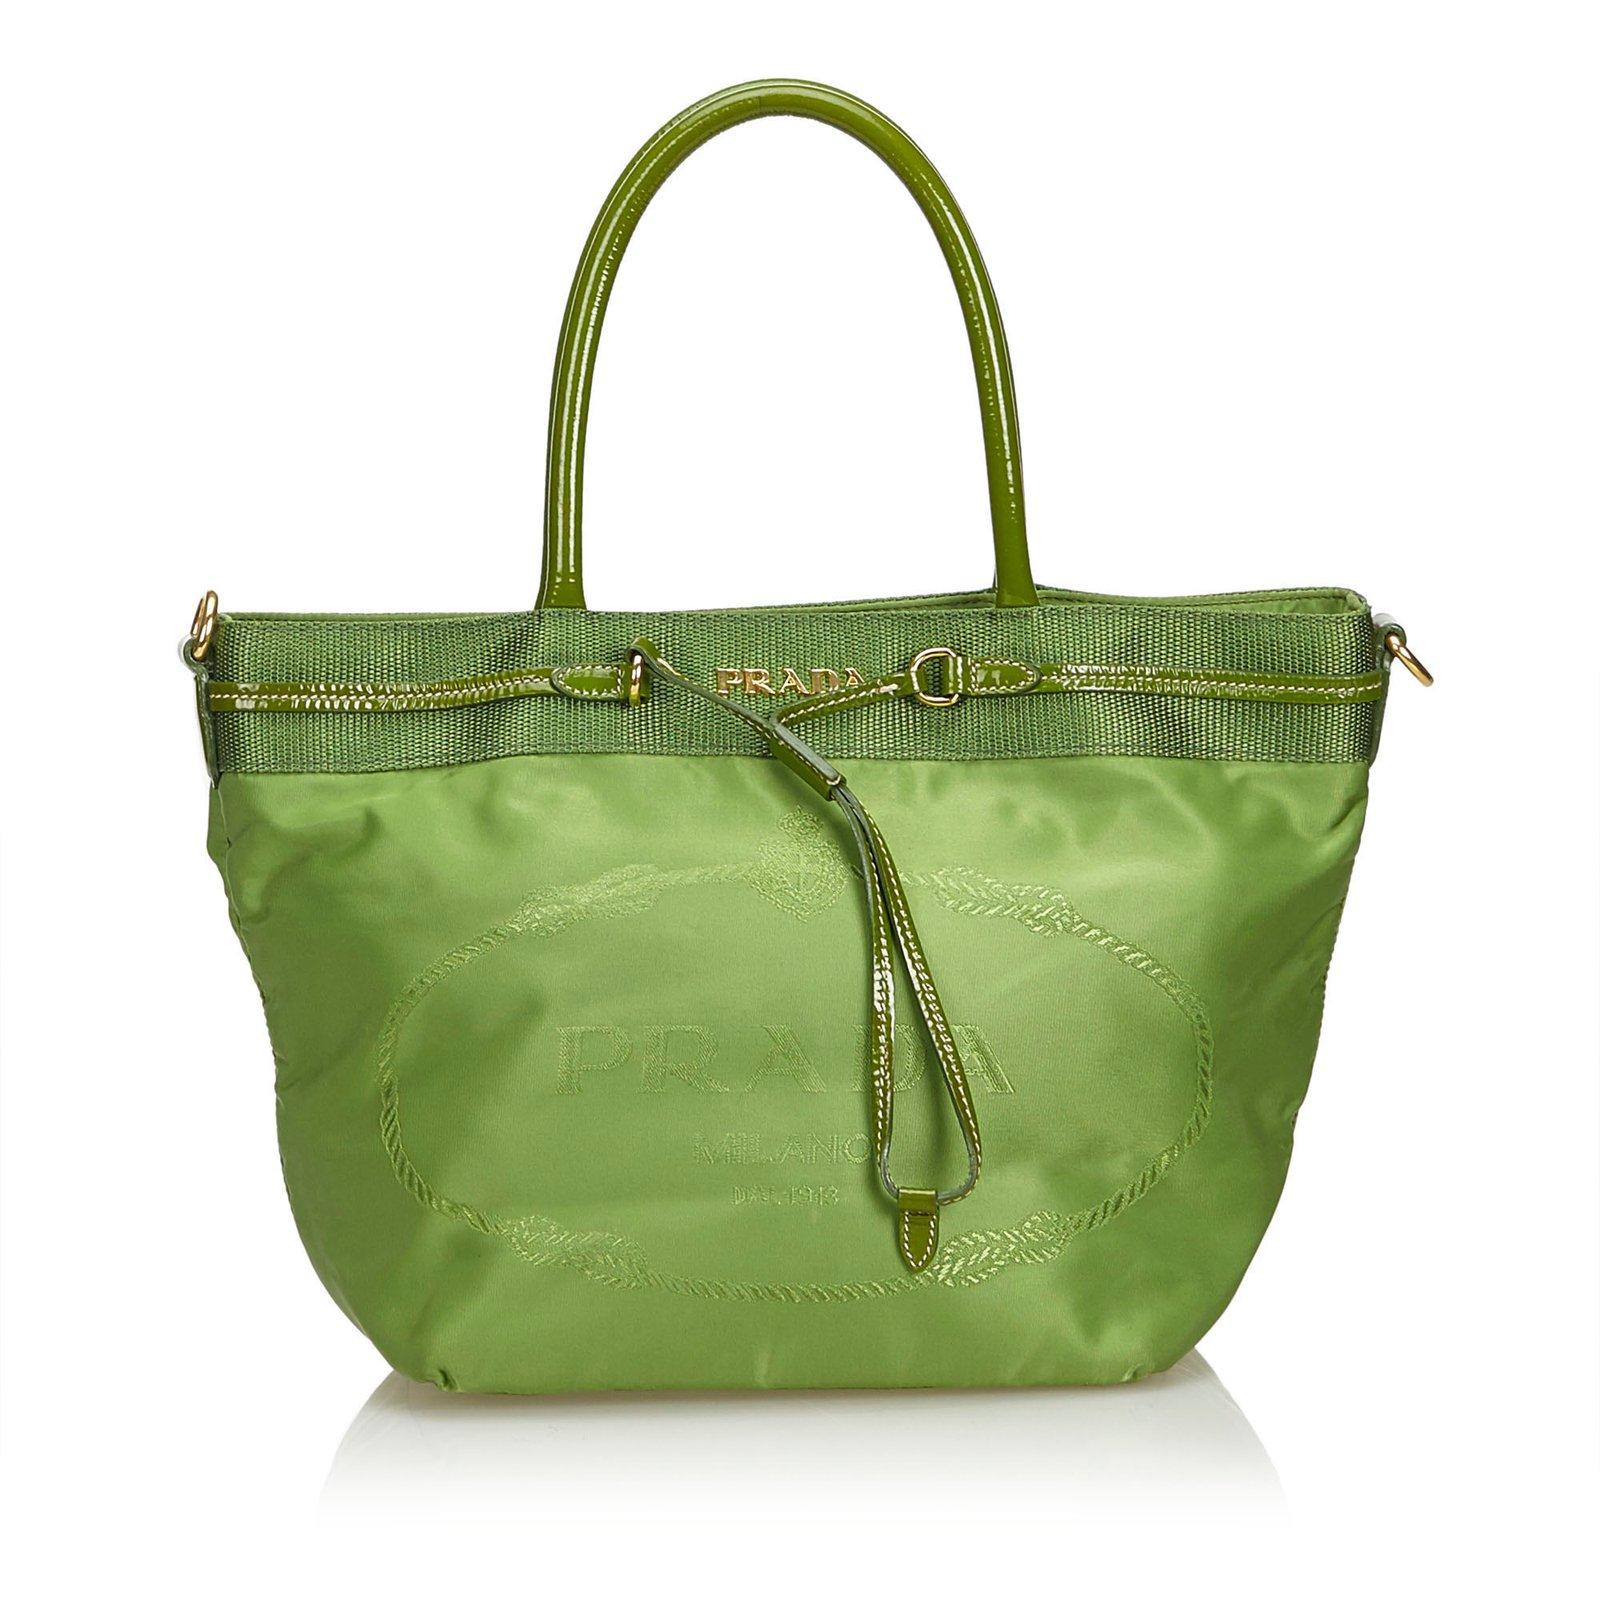 3f92e5cdab9d7 Prada Tessuto Nylon Tote Bag Totes Leather